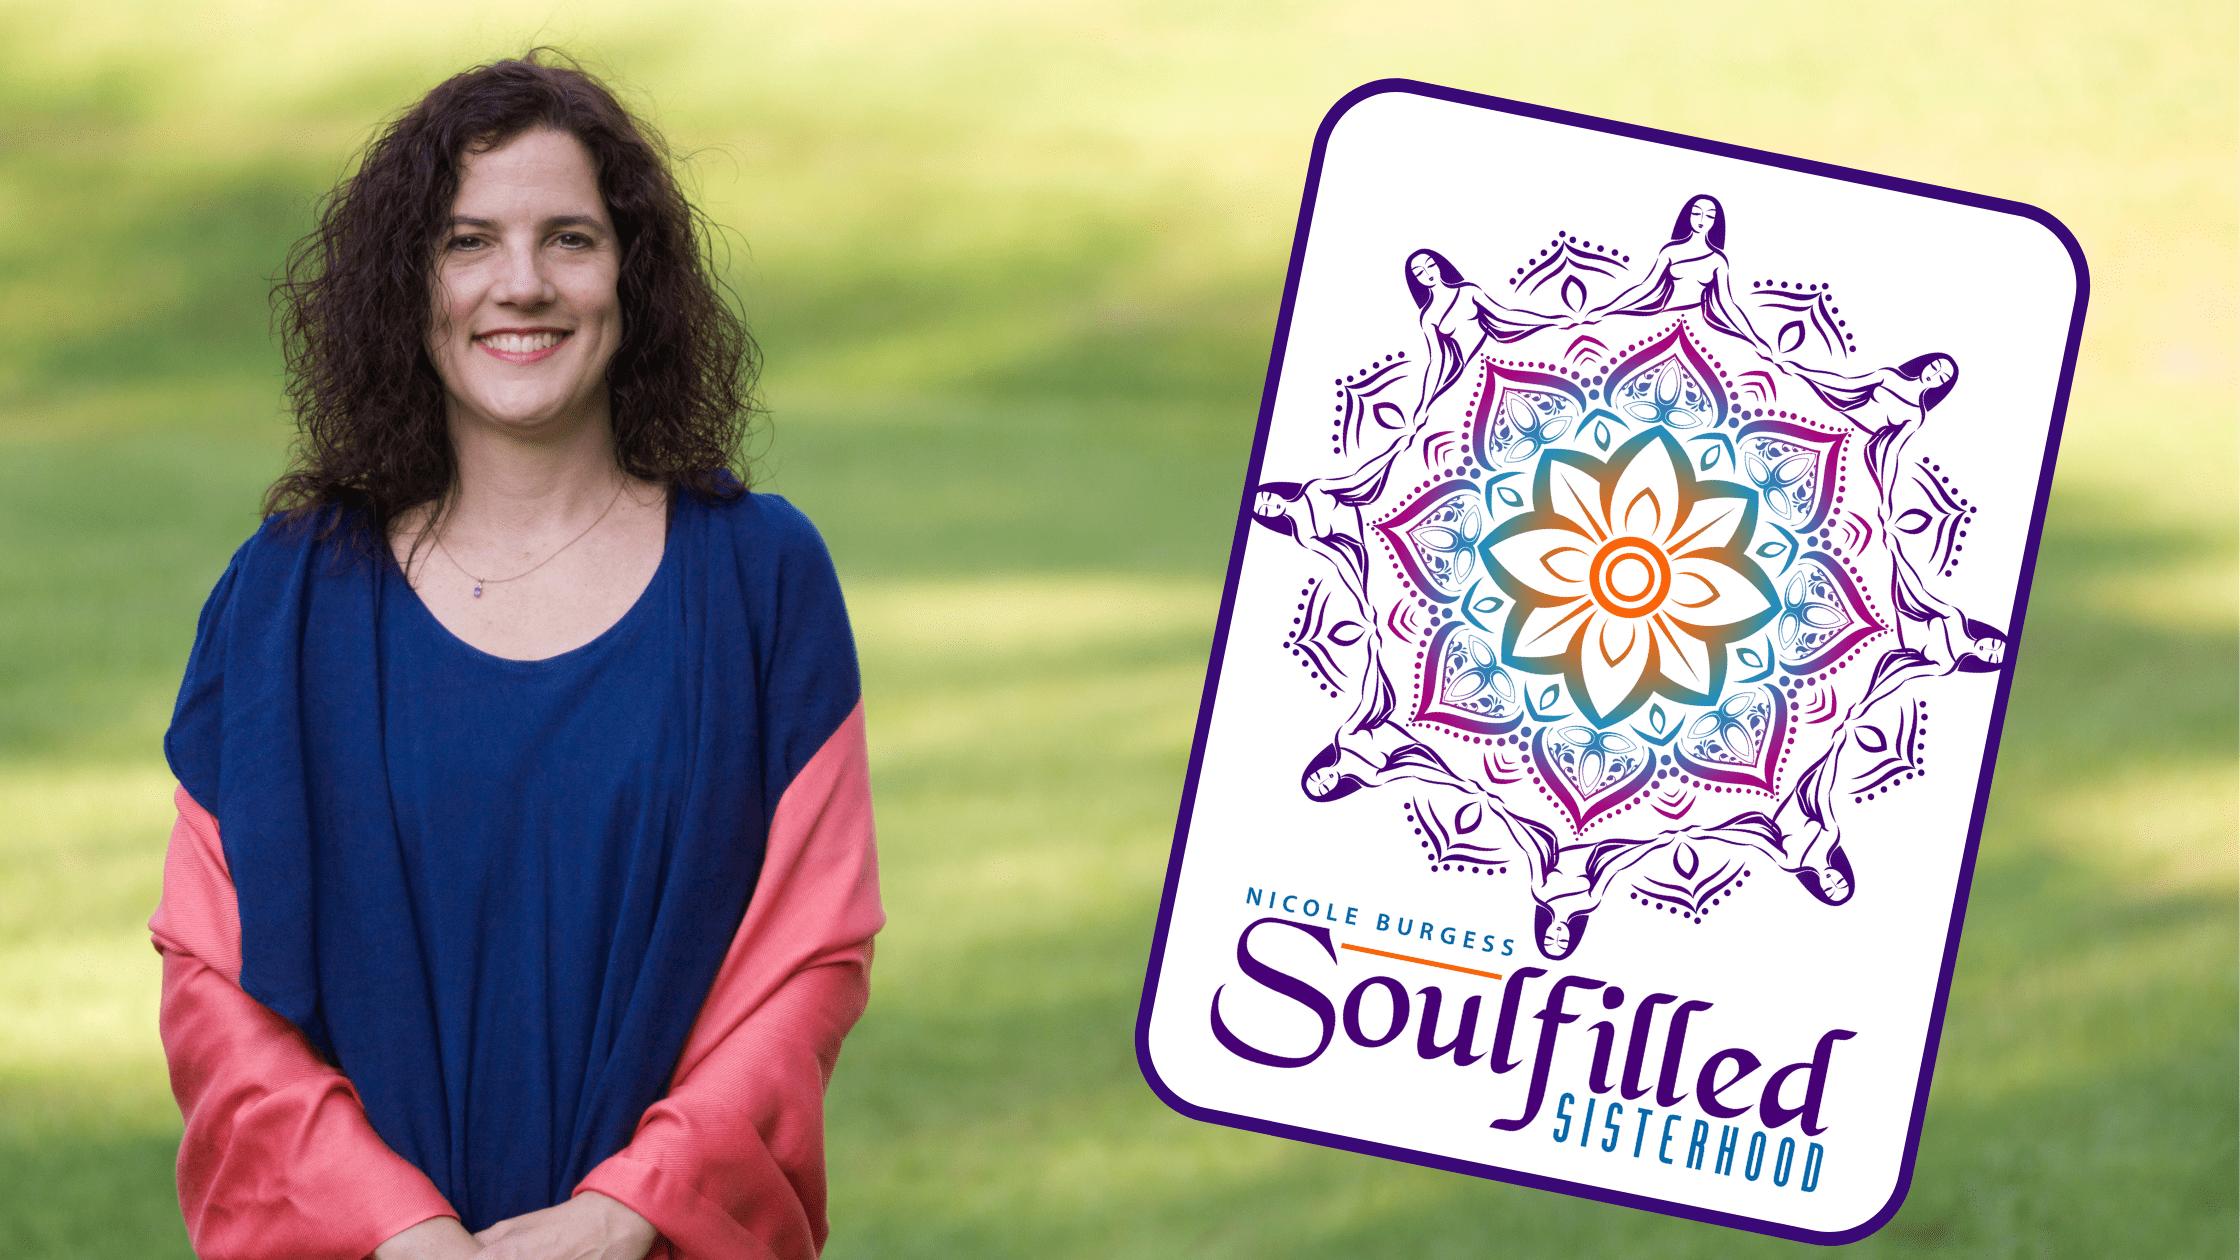 Soulfilled Sisterhood with Nicole Burgess, Soul Led Leadership Coach